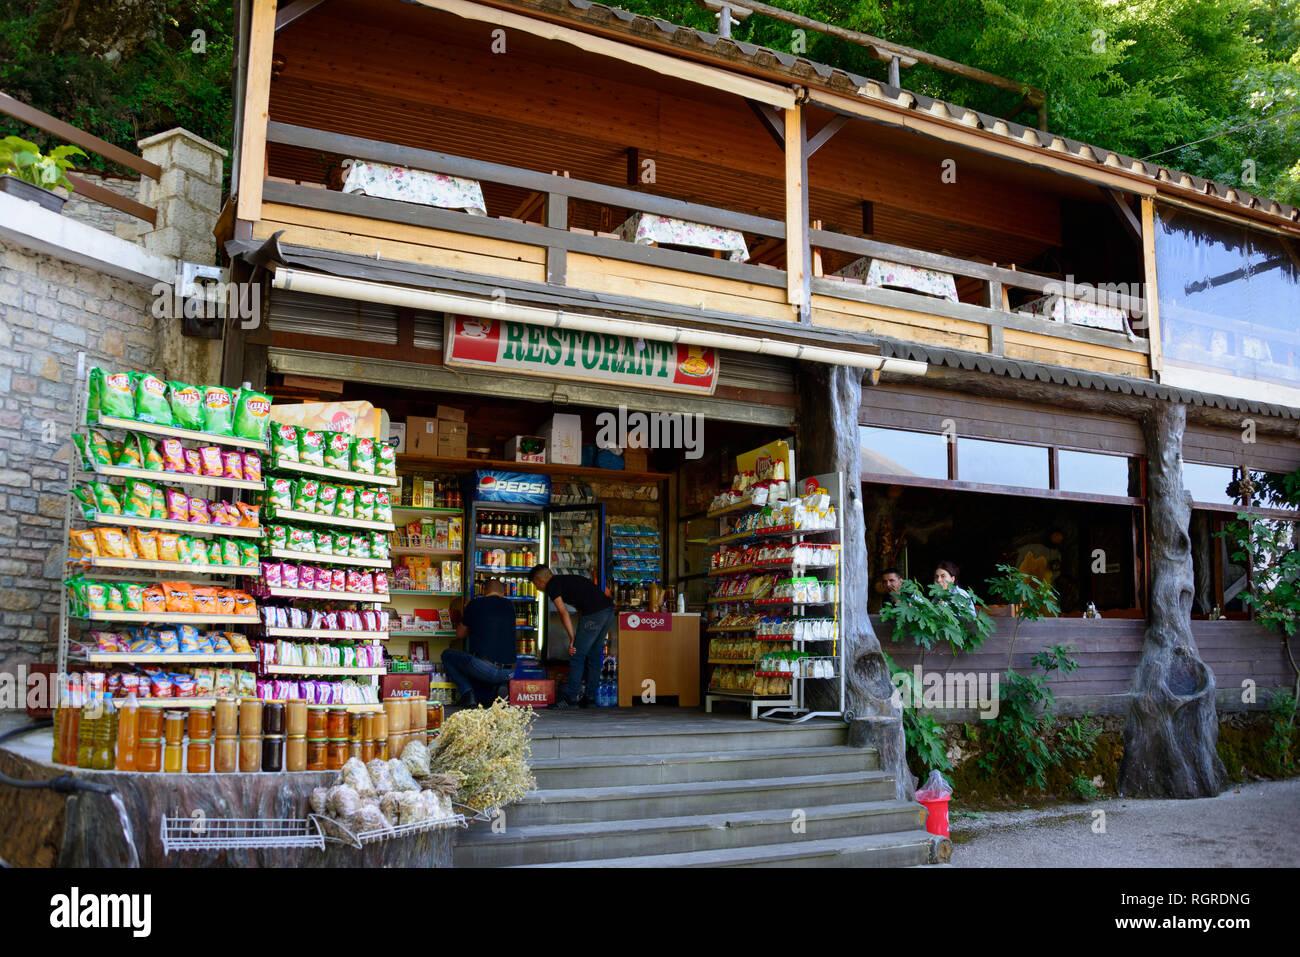 Sale of goods and restaurant, Uji i Ftothe, Albania - Stock Image